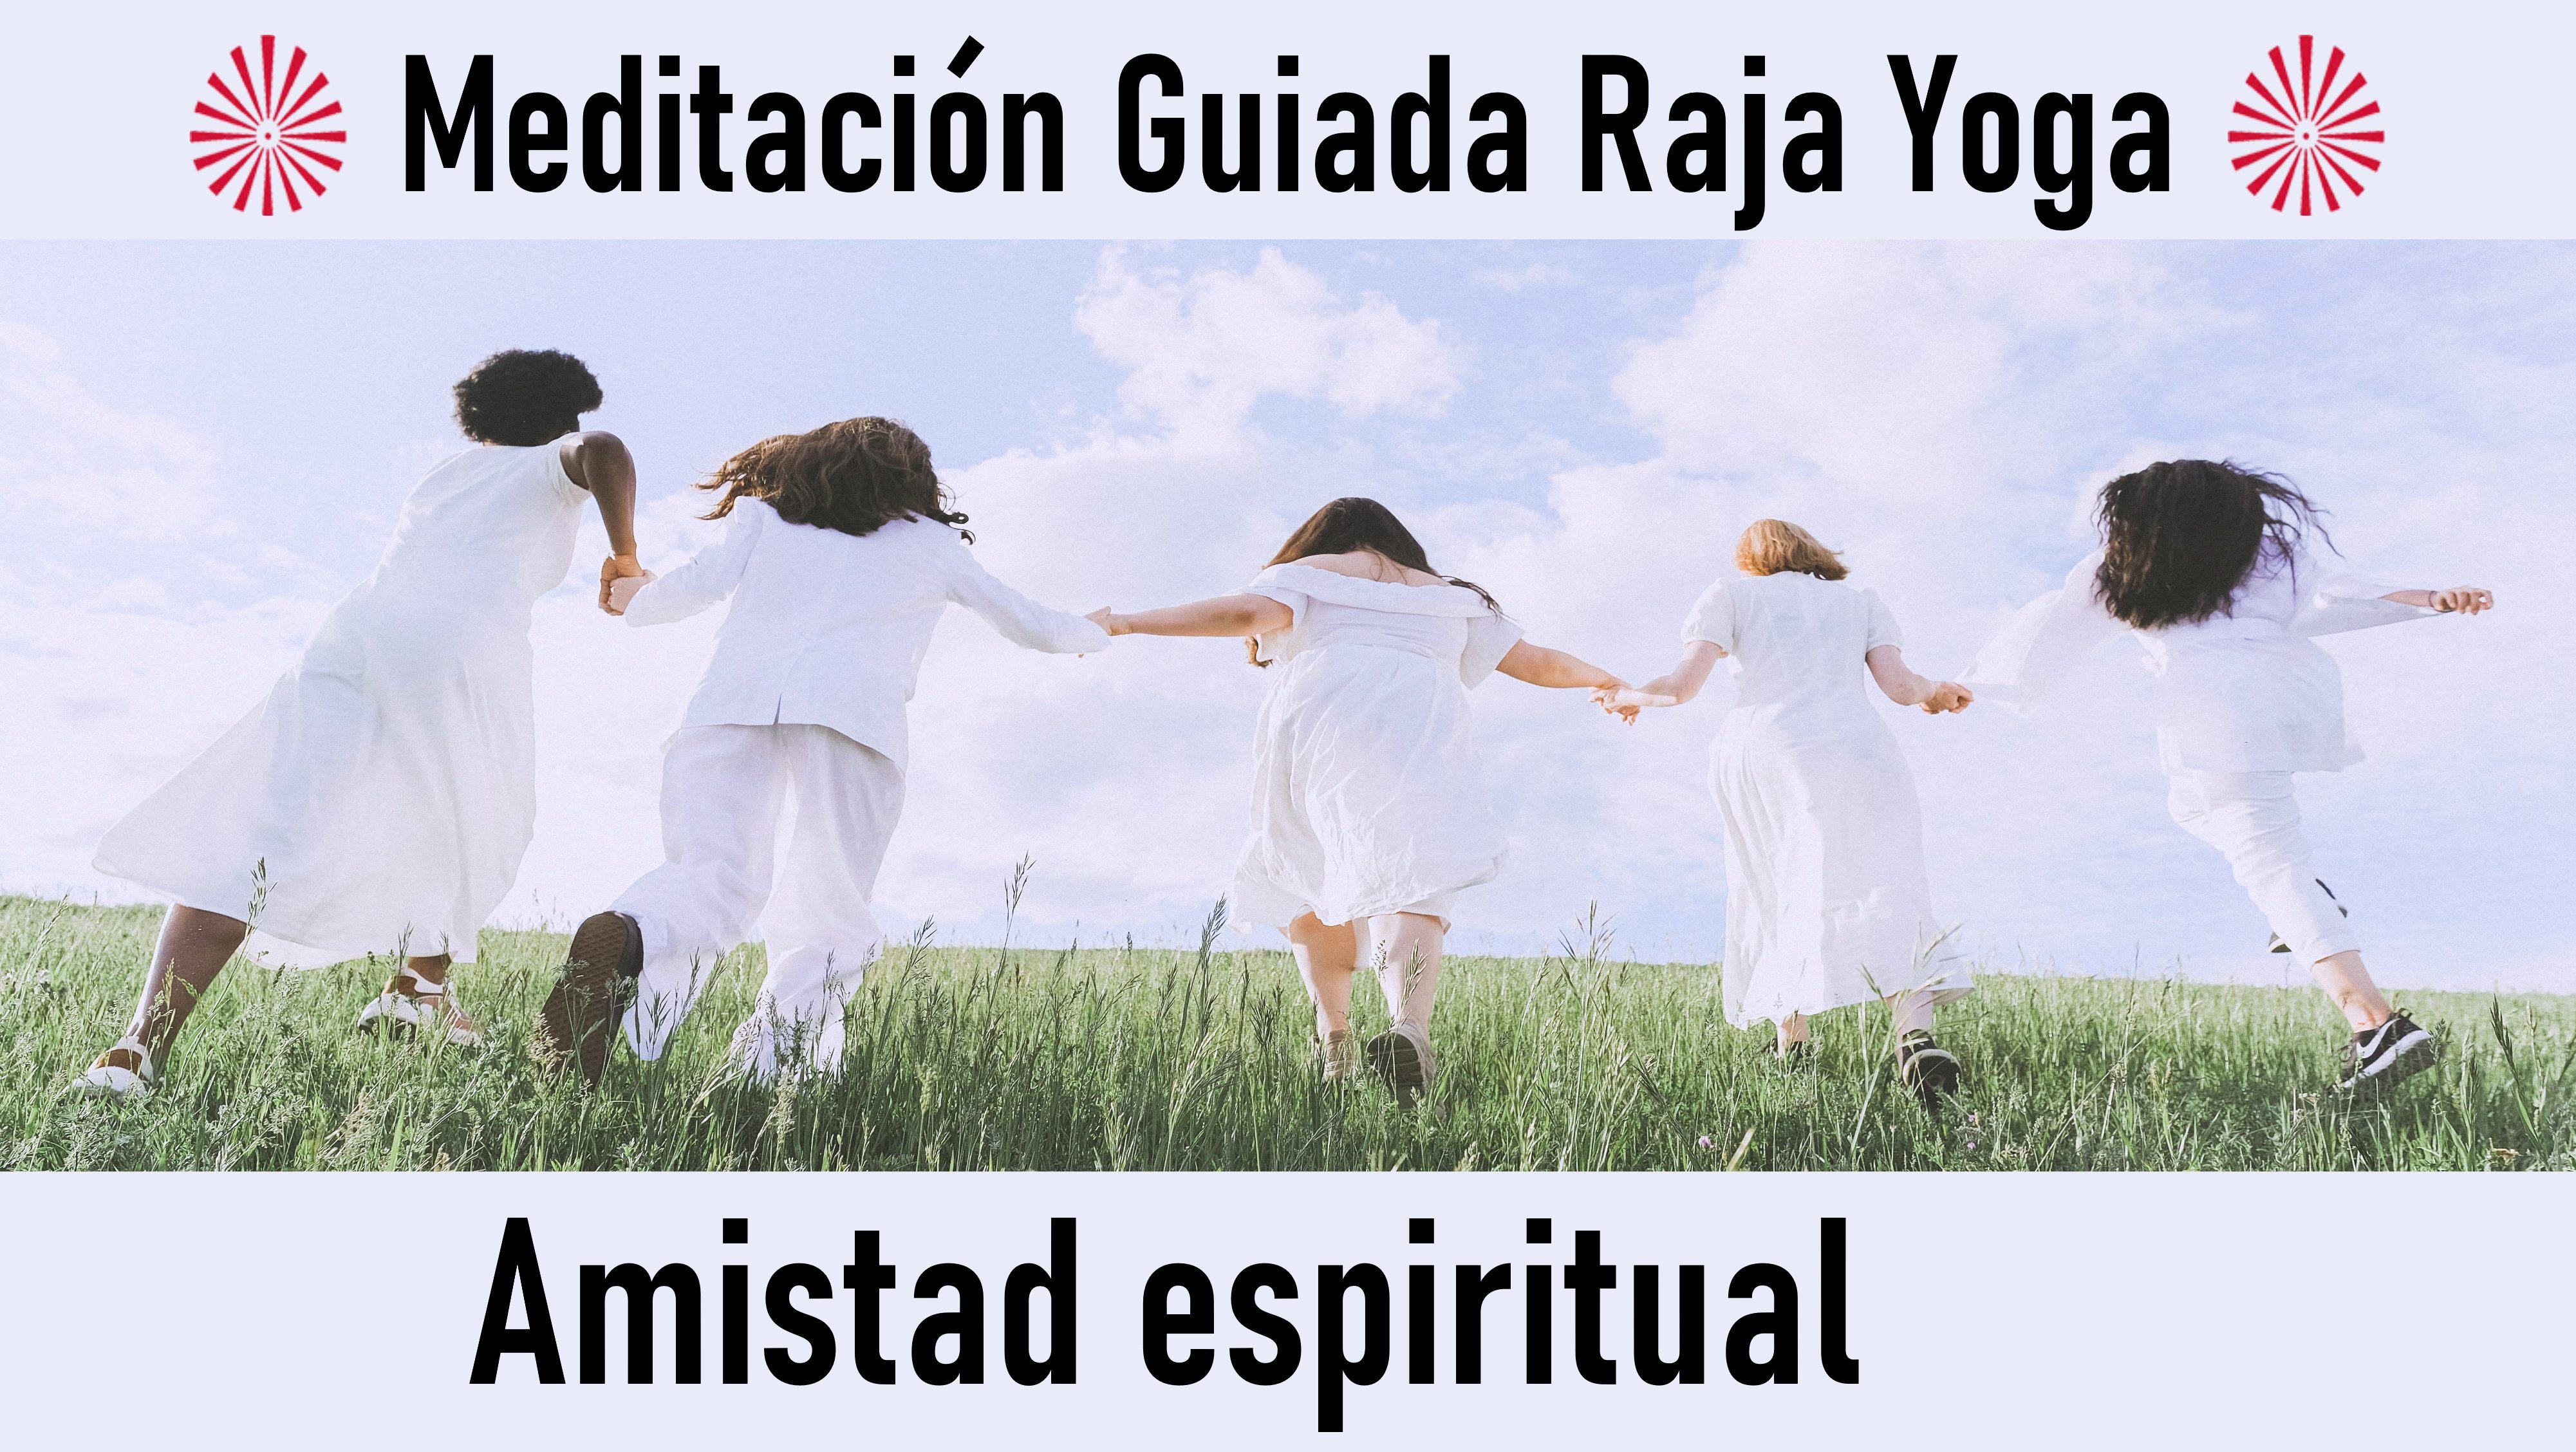 8 Octubre 2020  Meditación guiada: Amistad espiritual